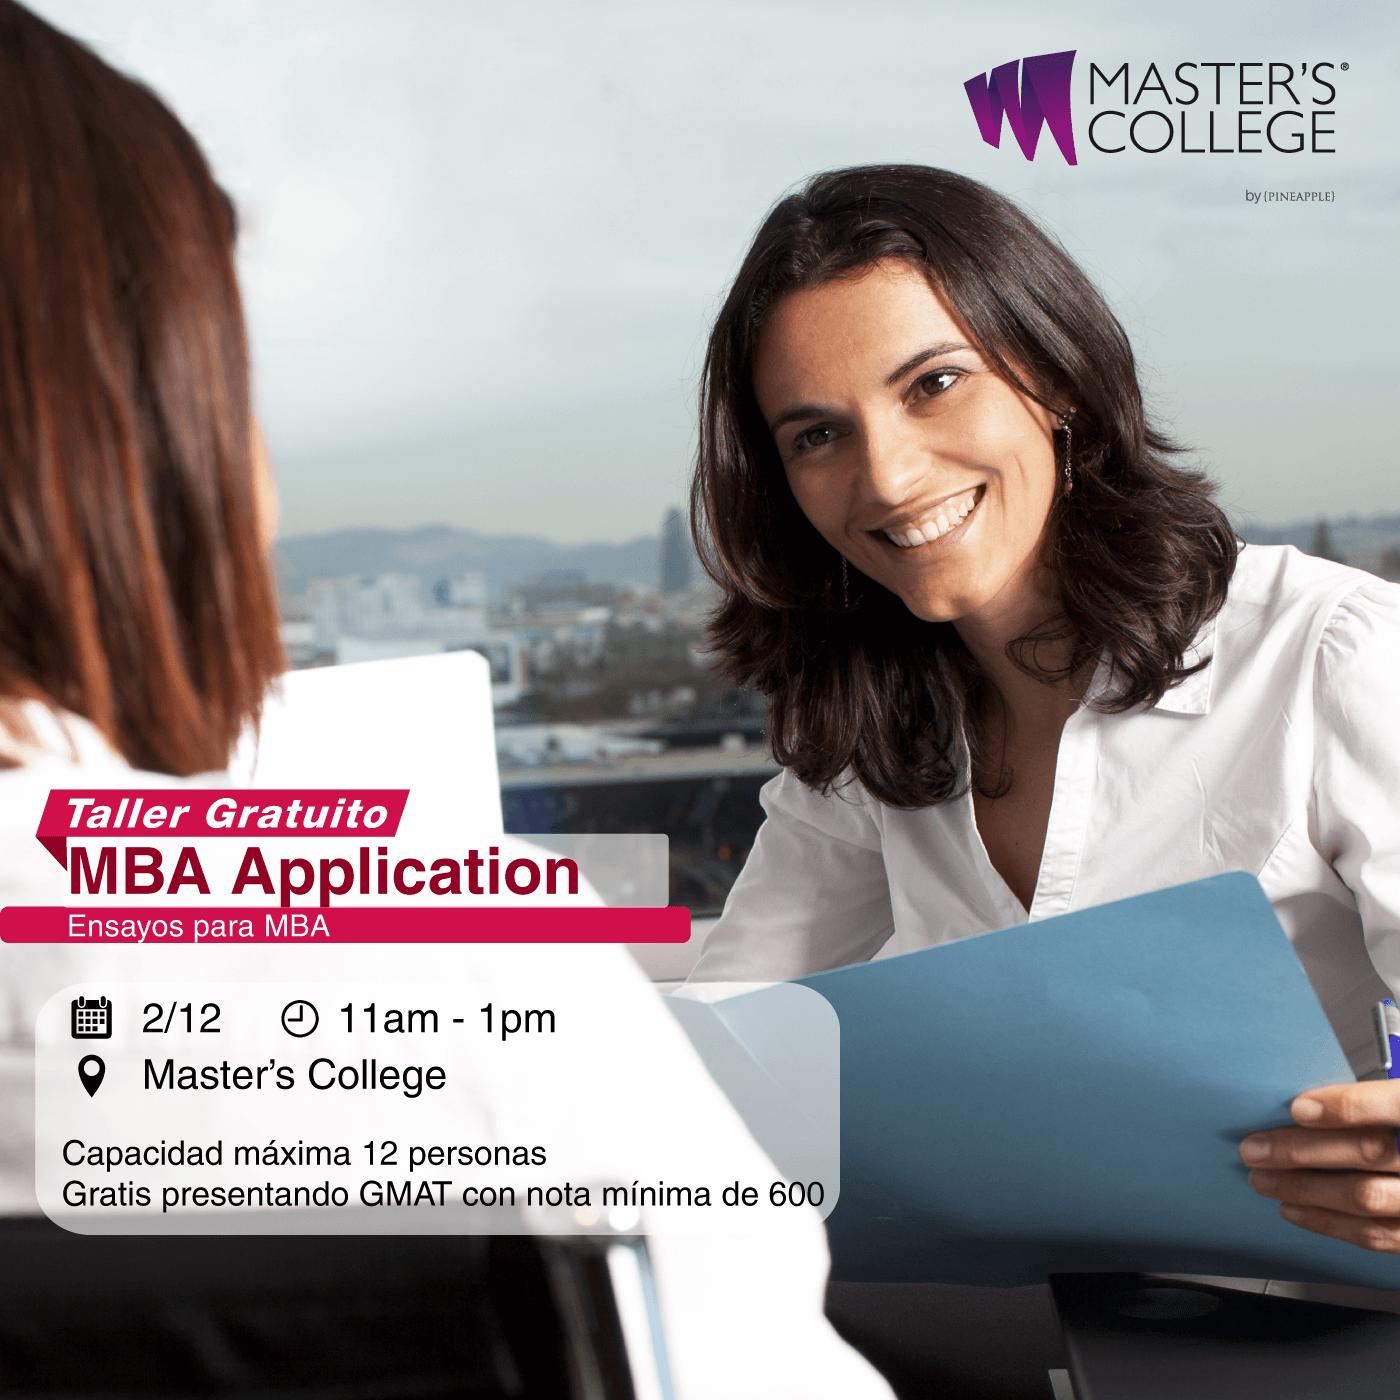 Taller gratuito: MBA Application - Ensayos para MBA